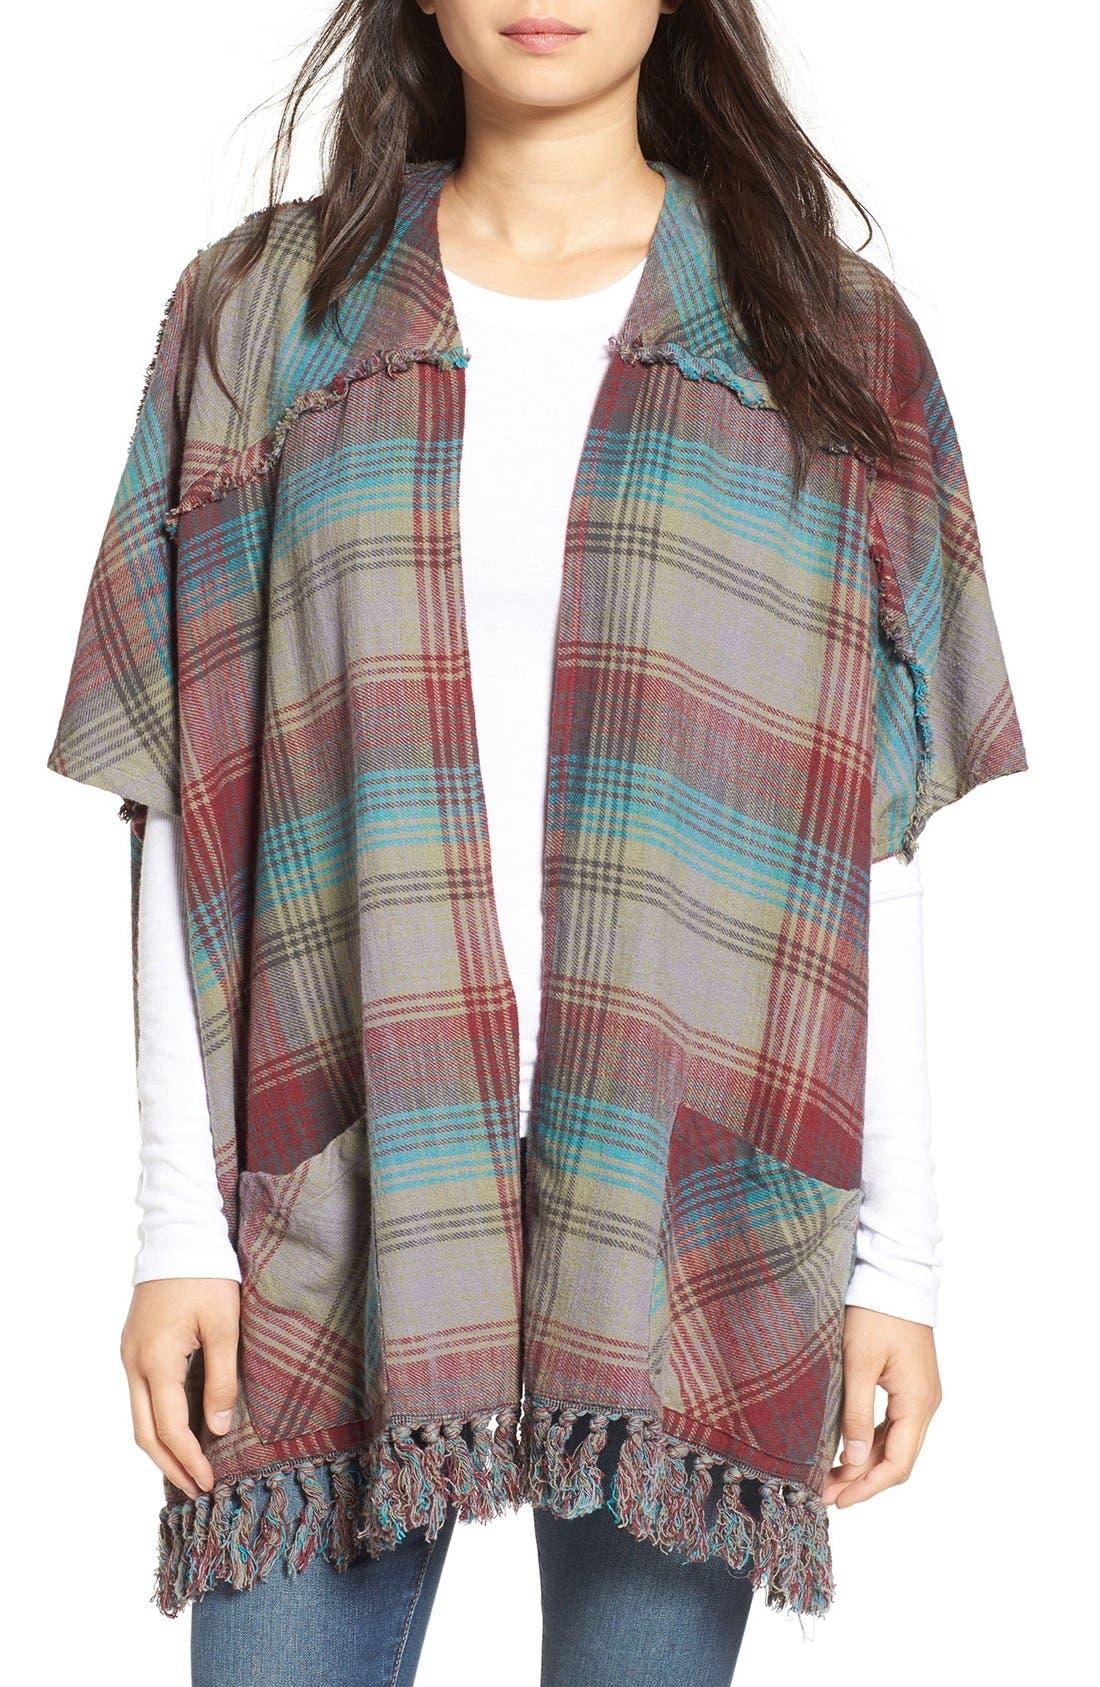 Alternate Image 1 Selected - Billabong 'Forever Fall' Plaid Kimono Cardigan